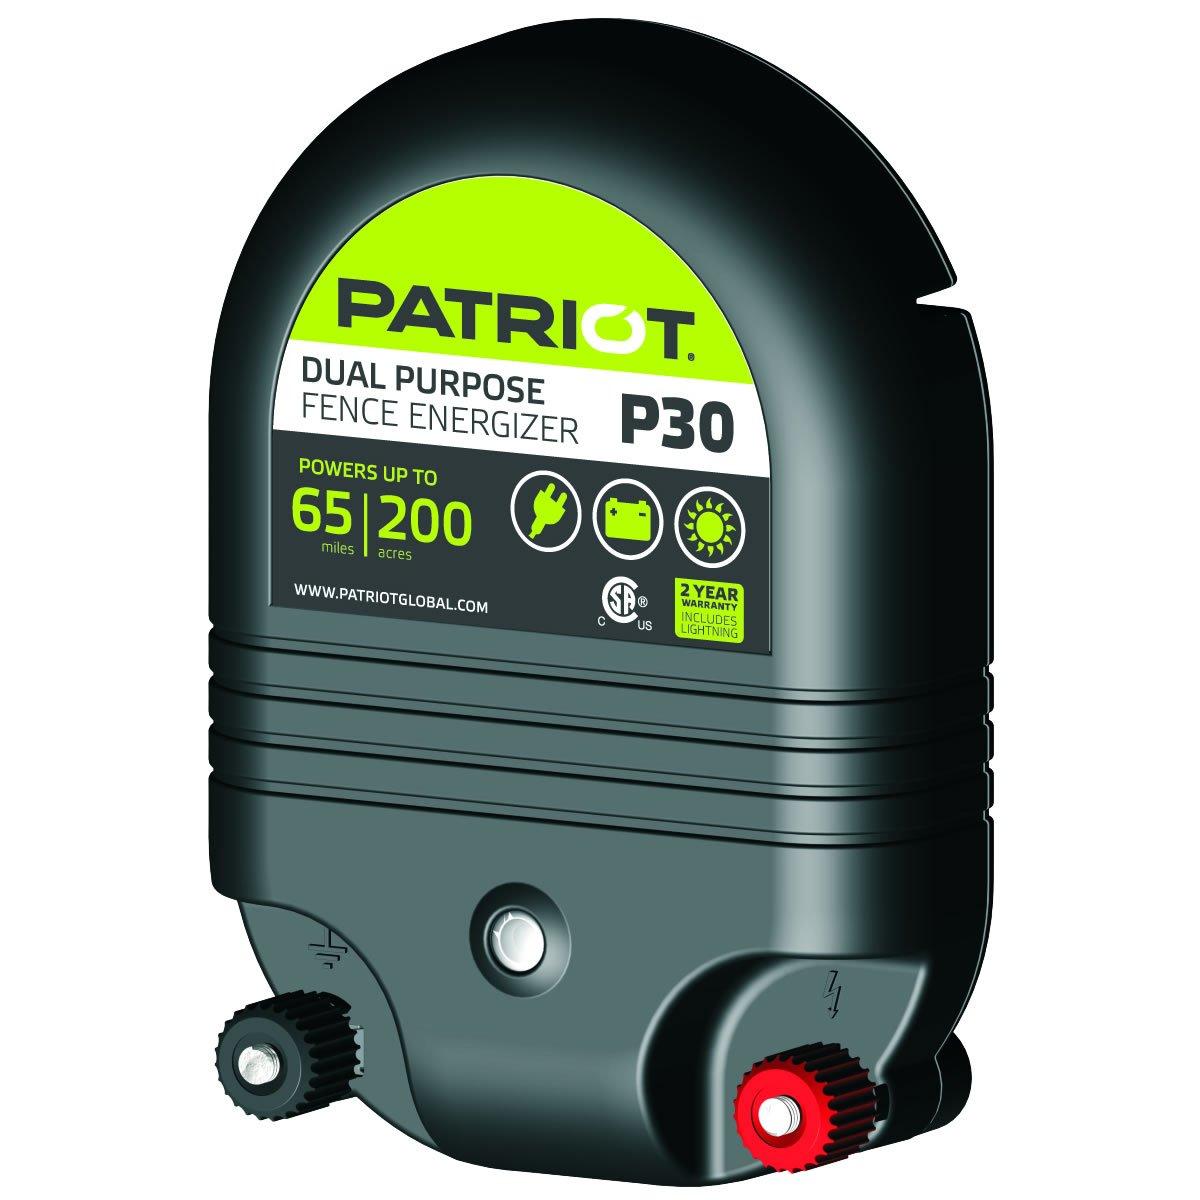 Patriot P30 Dual Purpose Electric Fence Energizer, 3.0 Joule by Patriot